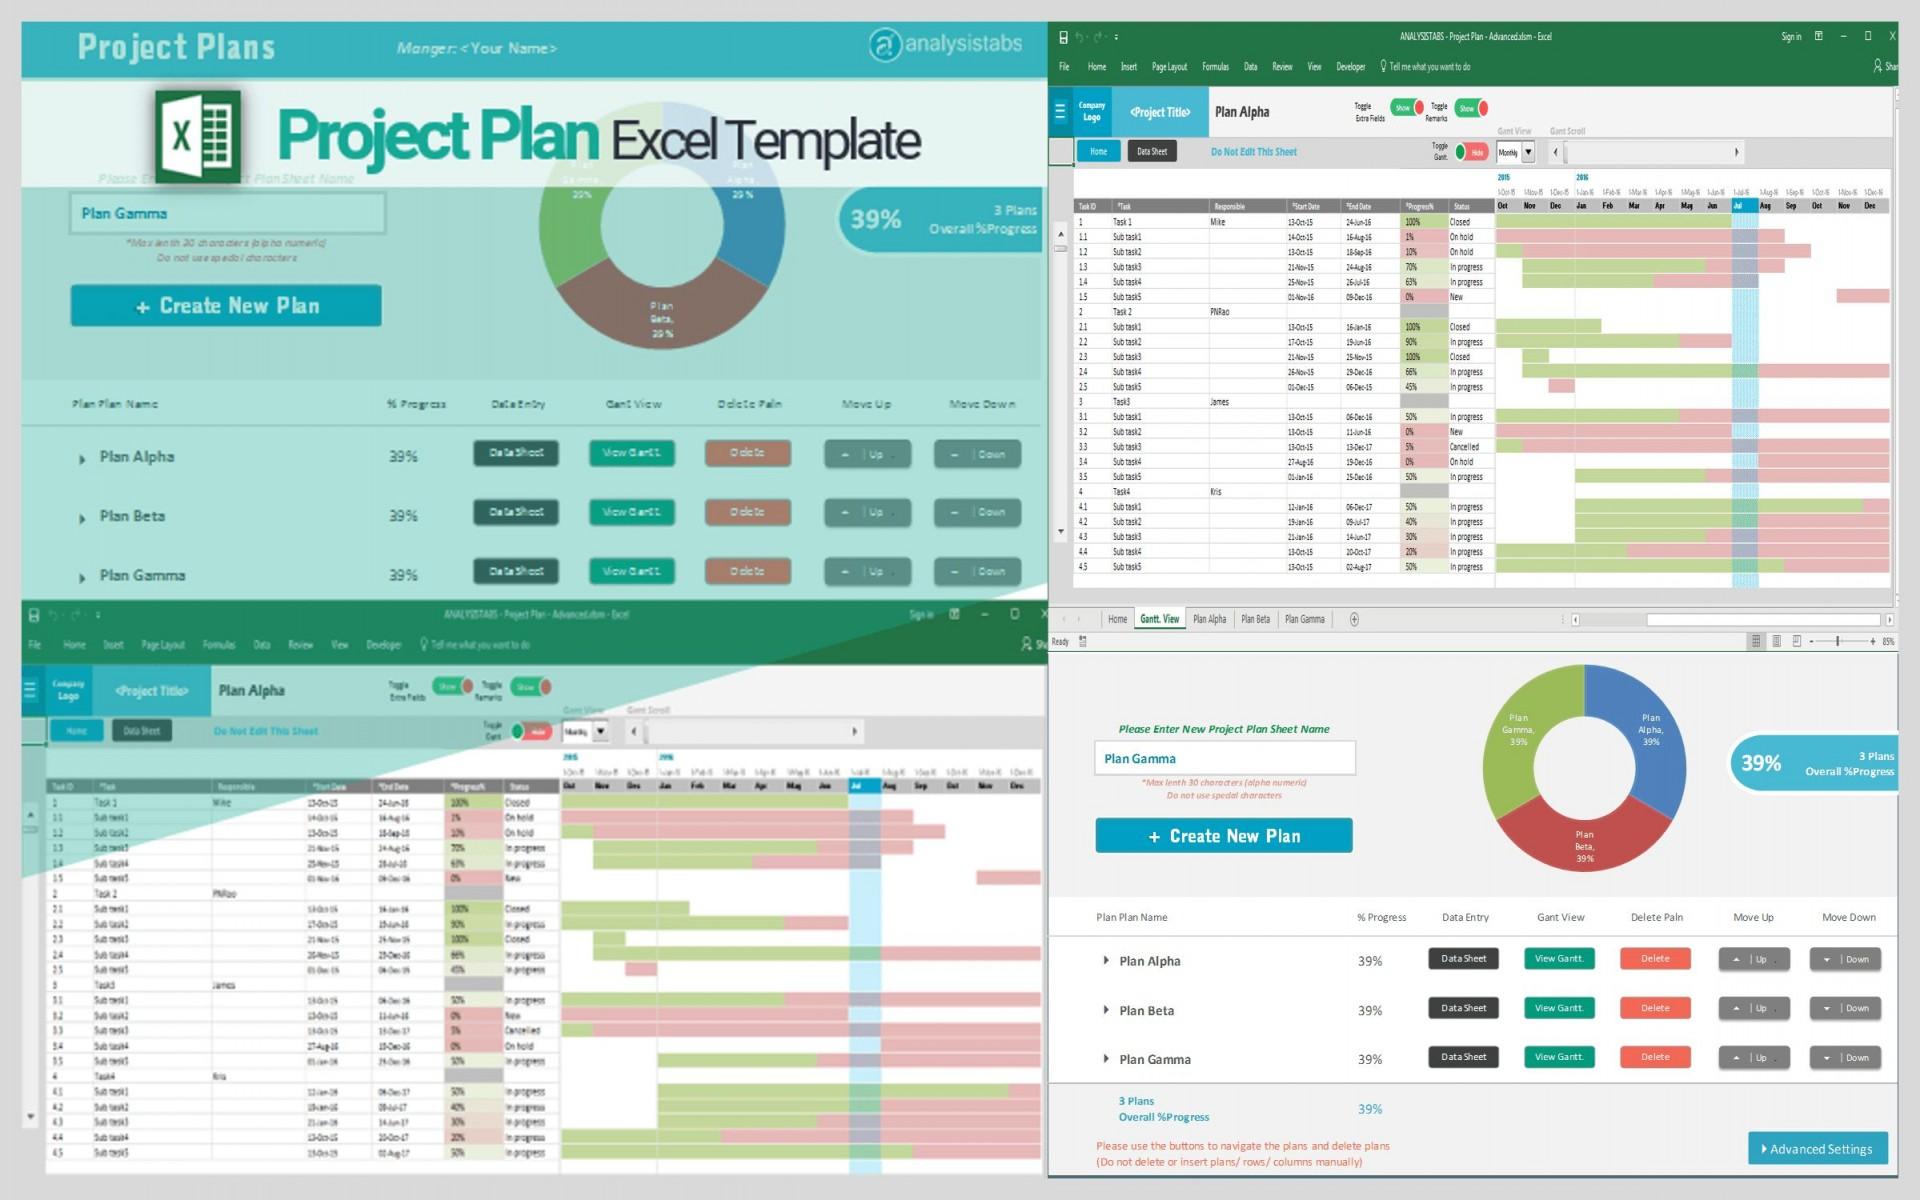 005 Stupendou Project Plan Template Excel Free Image  Action Download Xl Xlsx1920